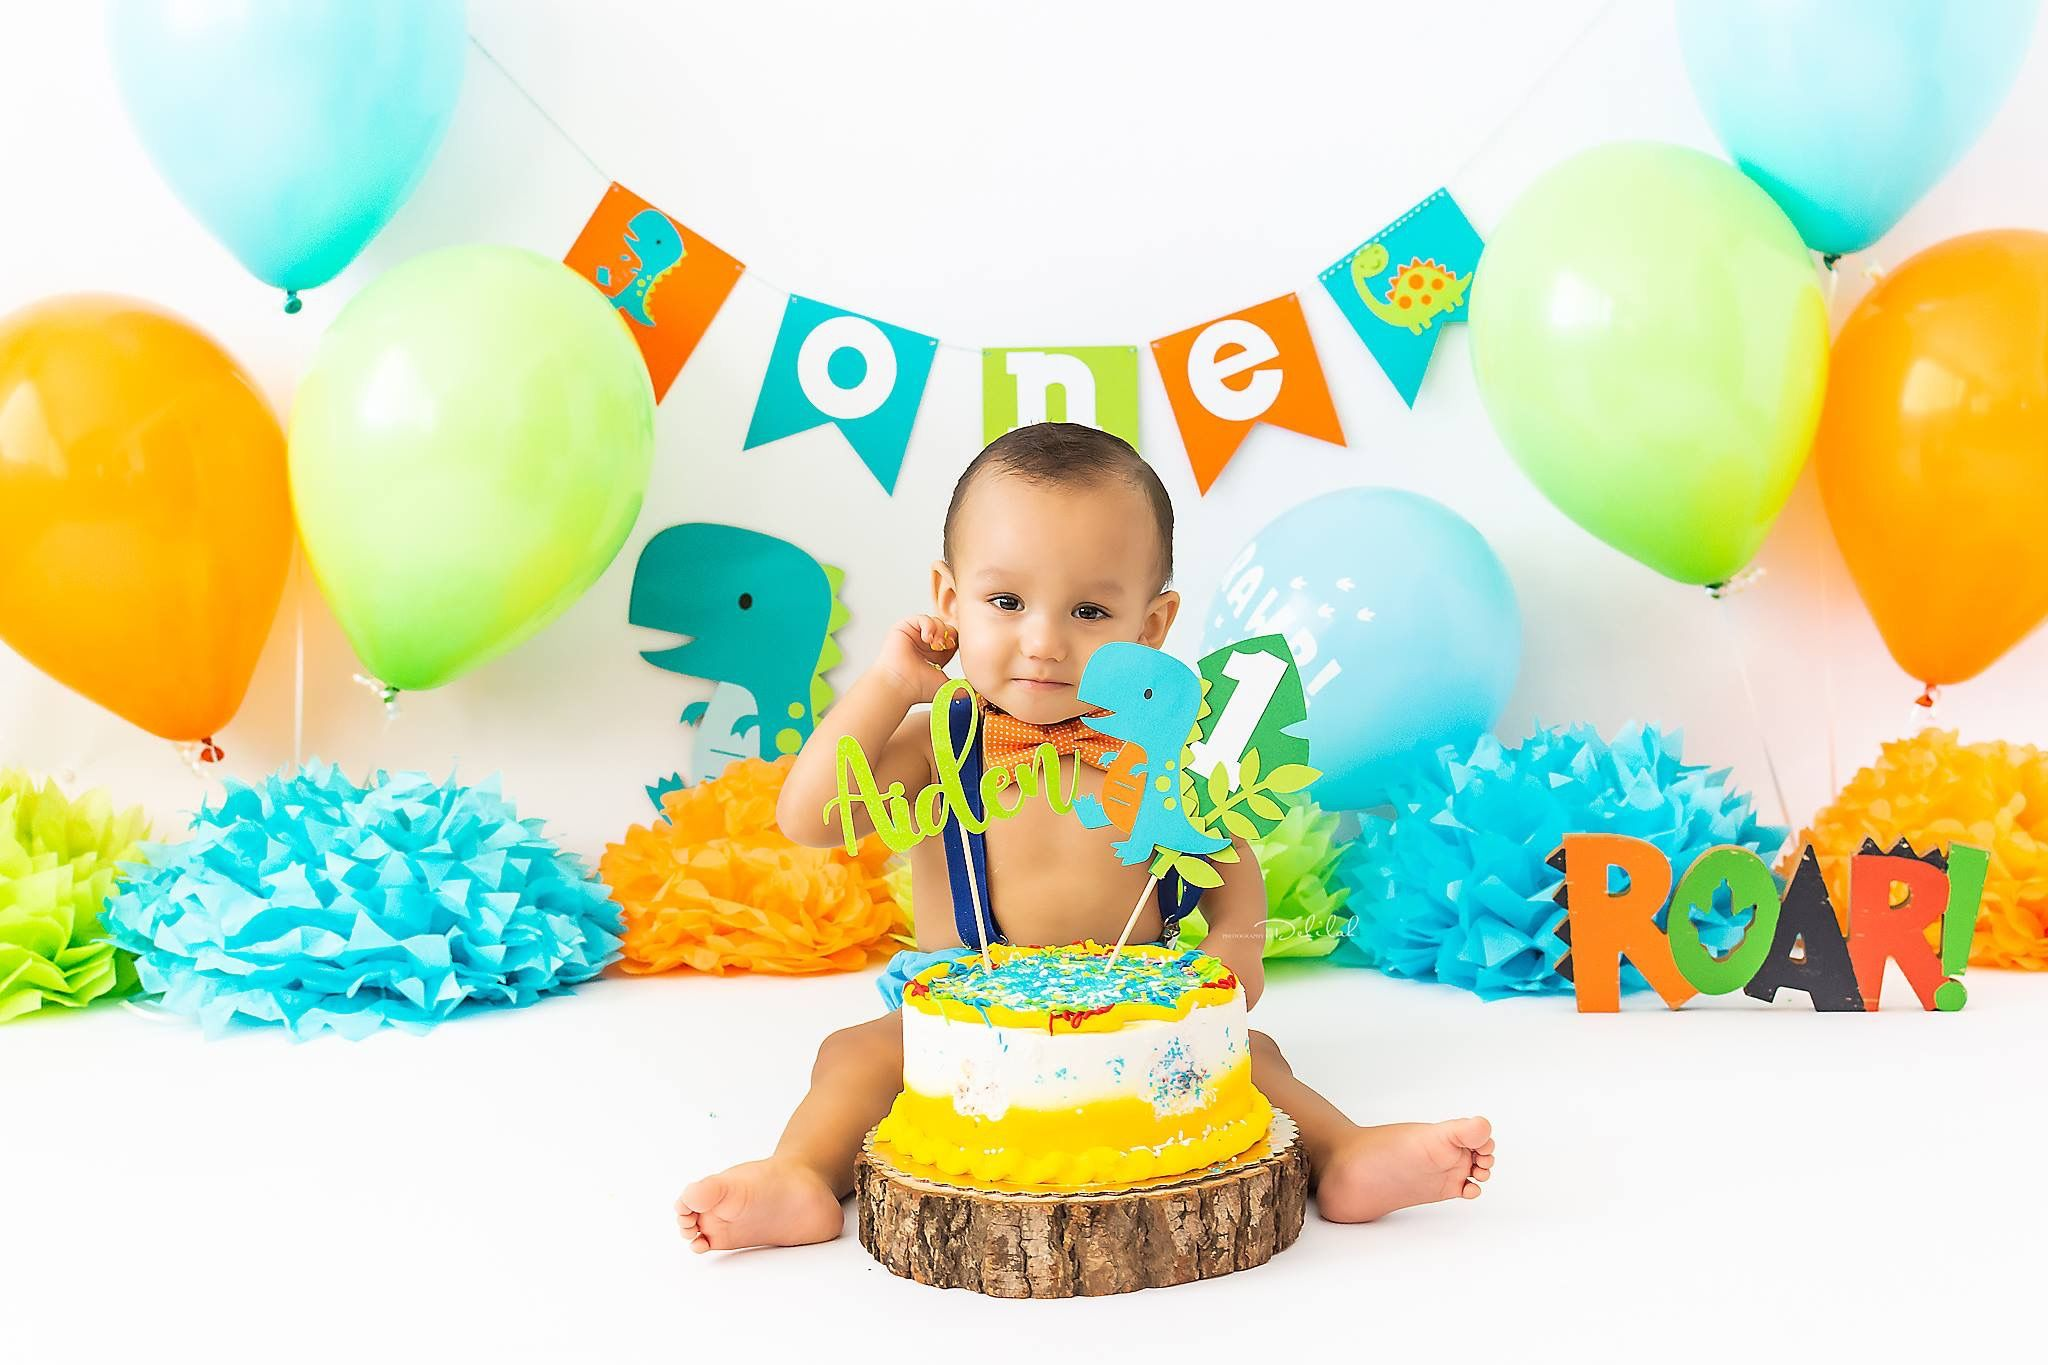 Baby Boy 1st Birthday Cake Smash Prop Outfit Dinosaur Themed Handmade